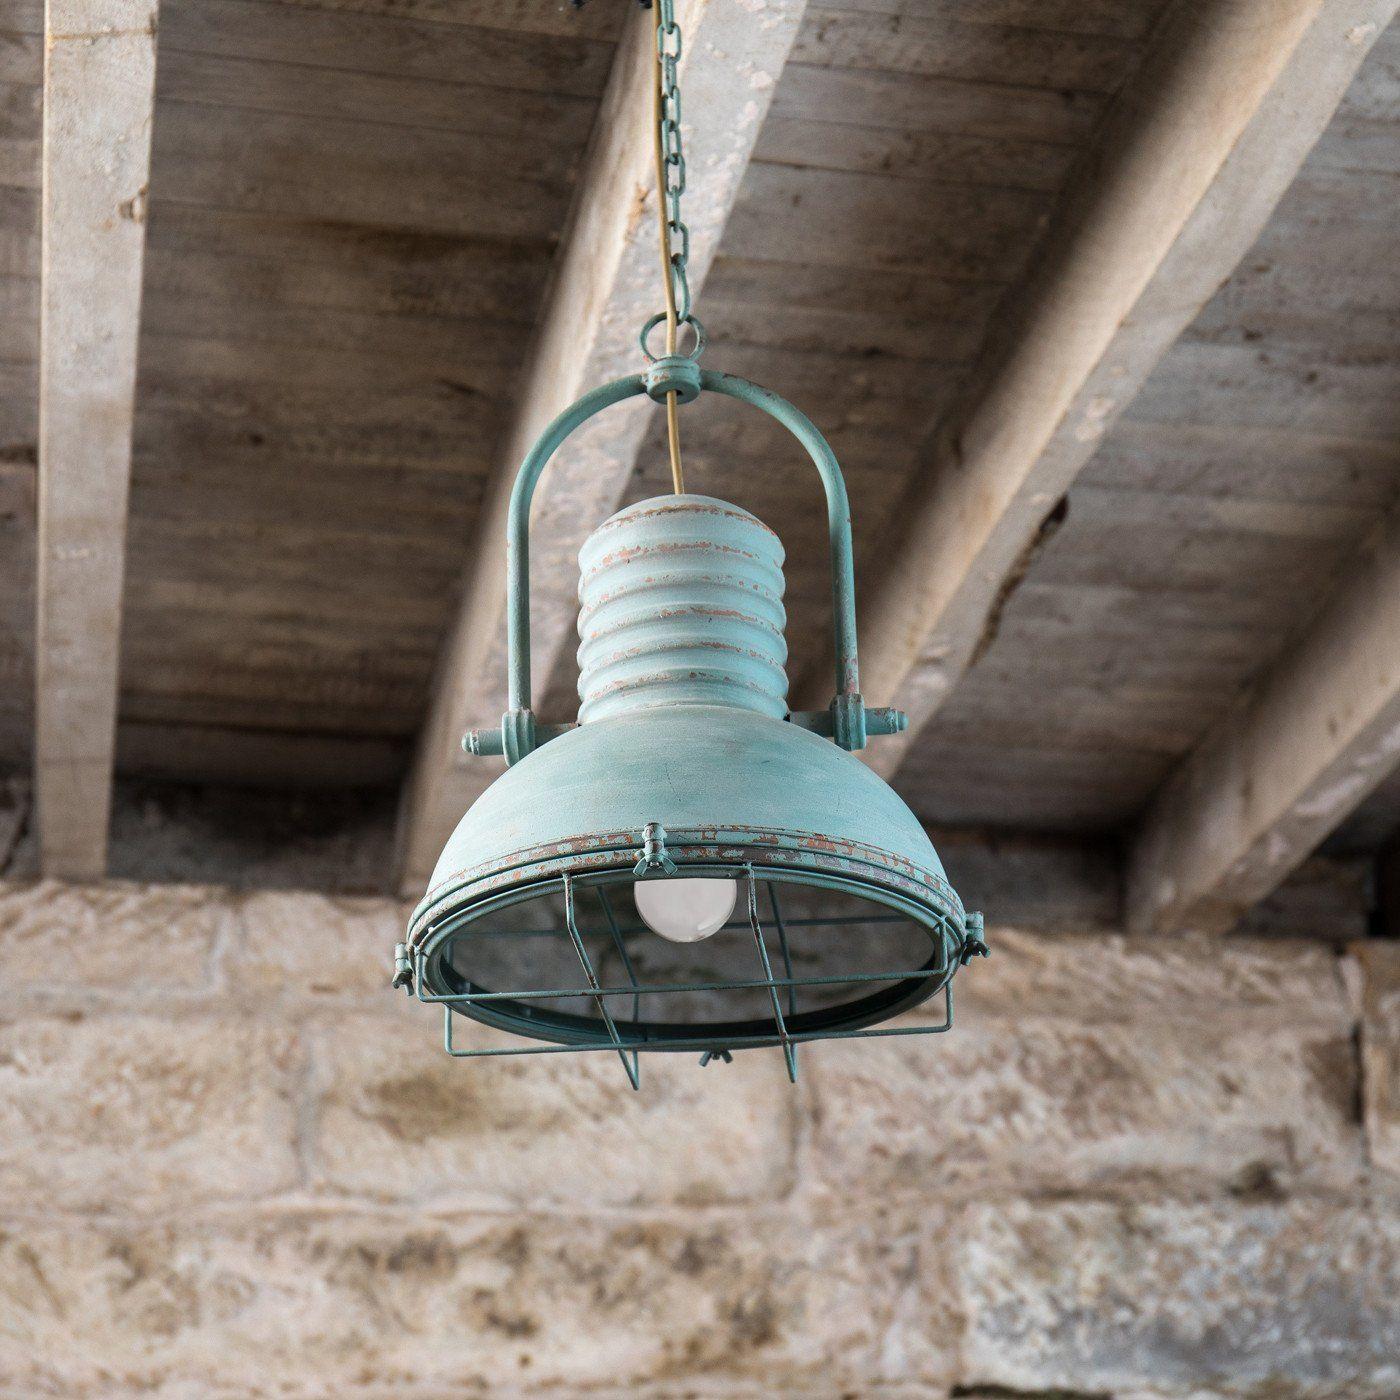 French industrial pendant light Industrial vintage pendant hanging light Mid century industrial decor.